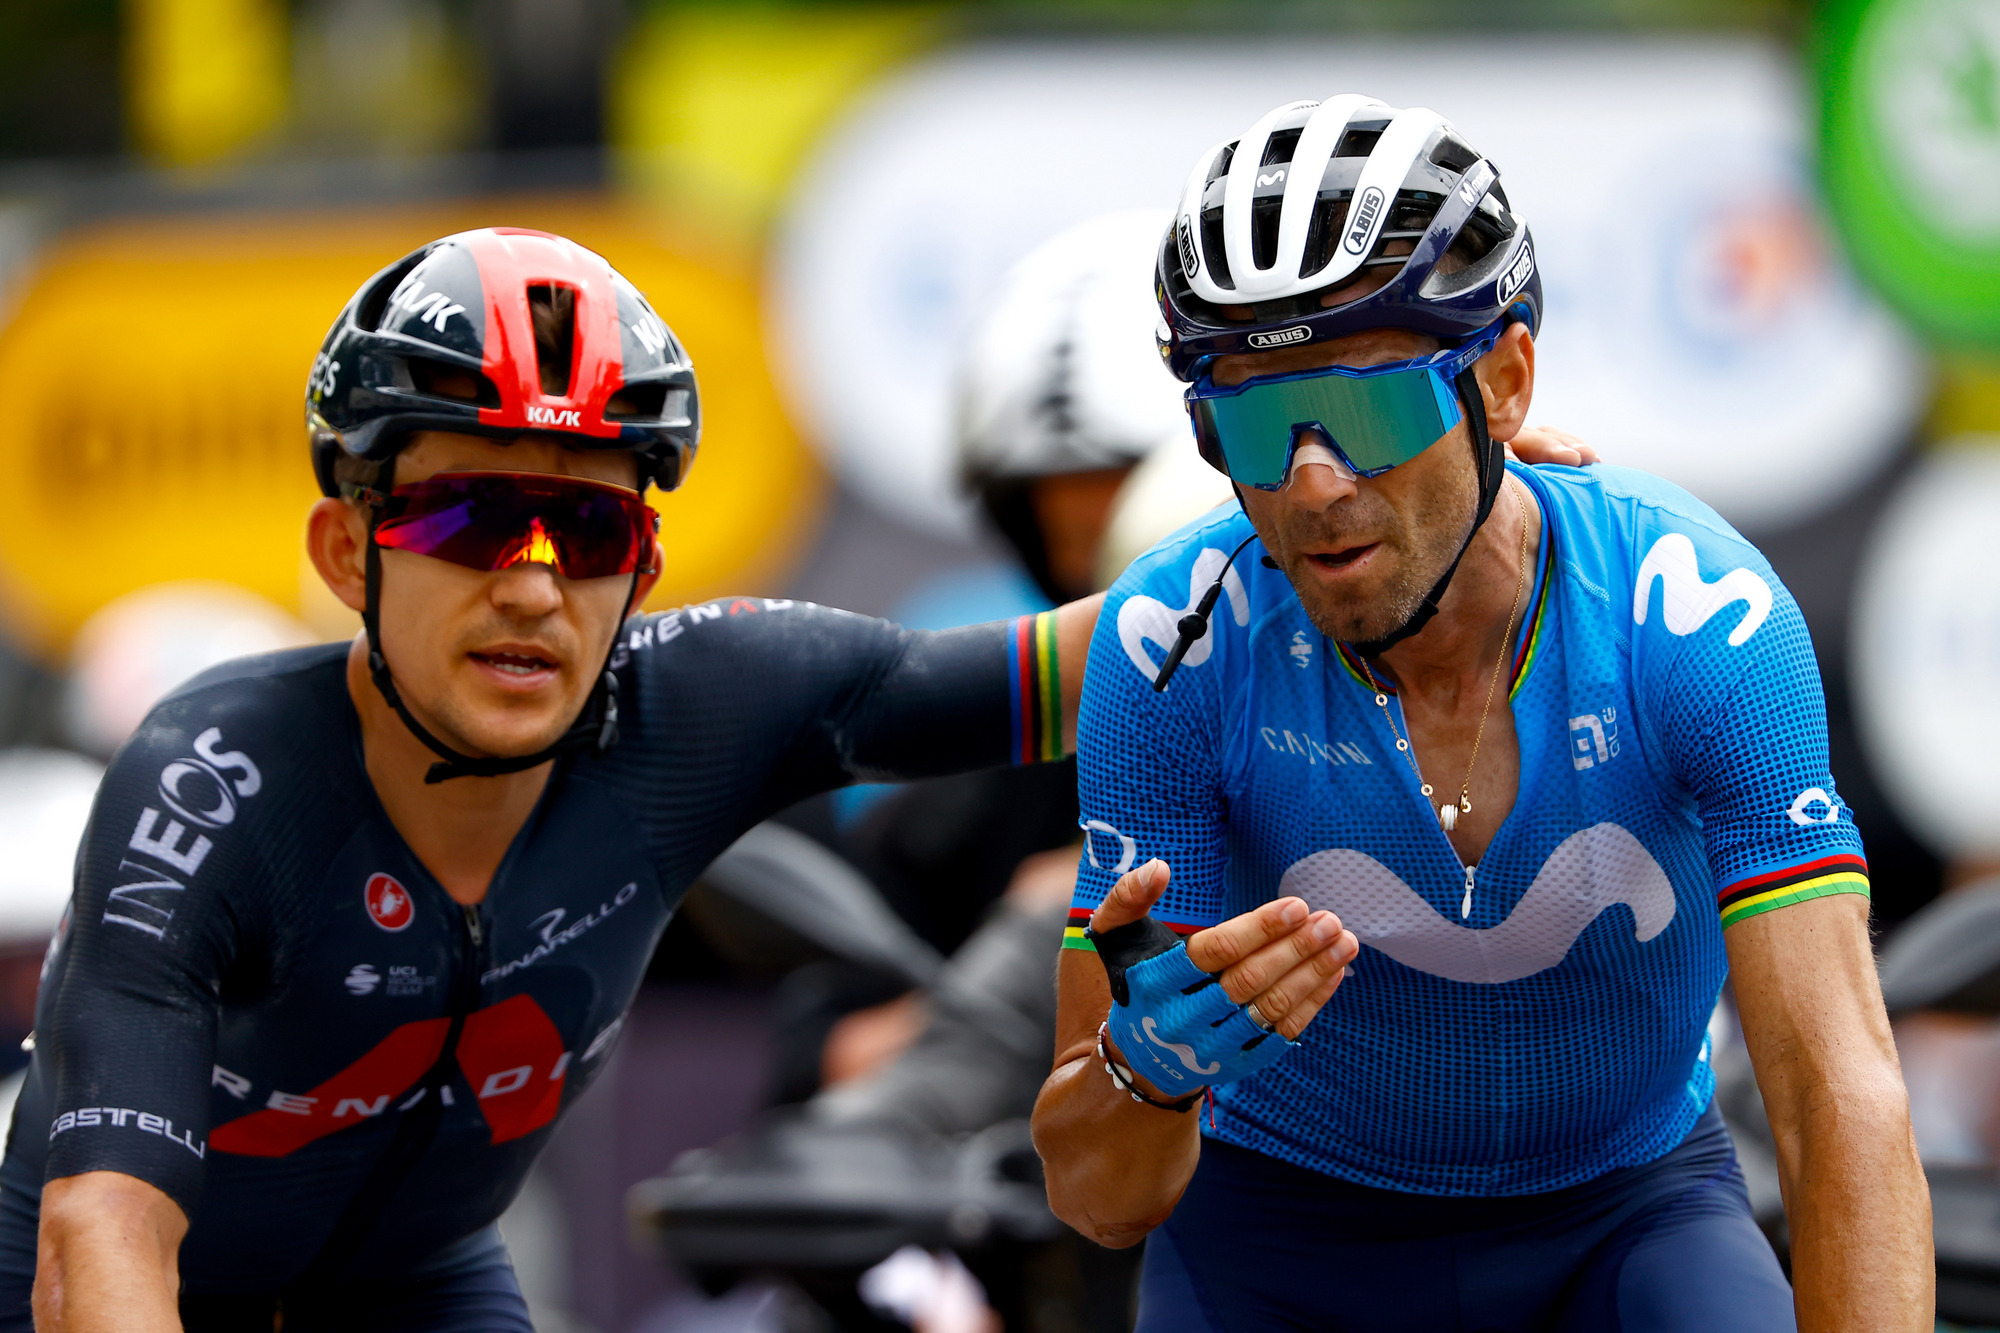 Tour de France 2021 108th Edition 7th stage Vierzon Le Creusot 2491 km 02072021 Michal Kwiatkowski POL Ineos Grenadiers Alejandro Valverde ESP Movistar Team photo Luca BettiniBettiniPhoto2021